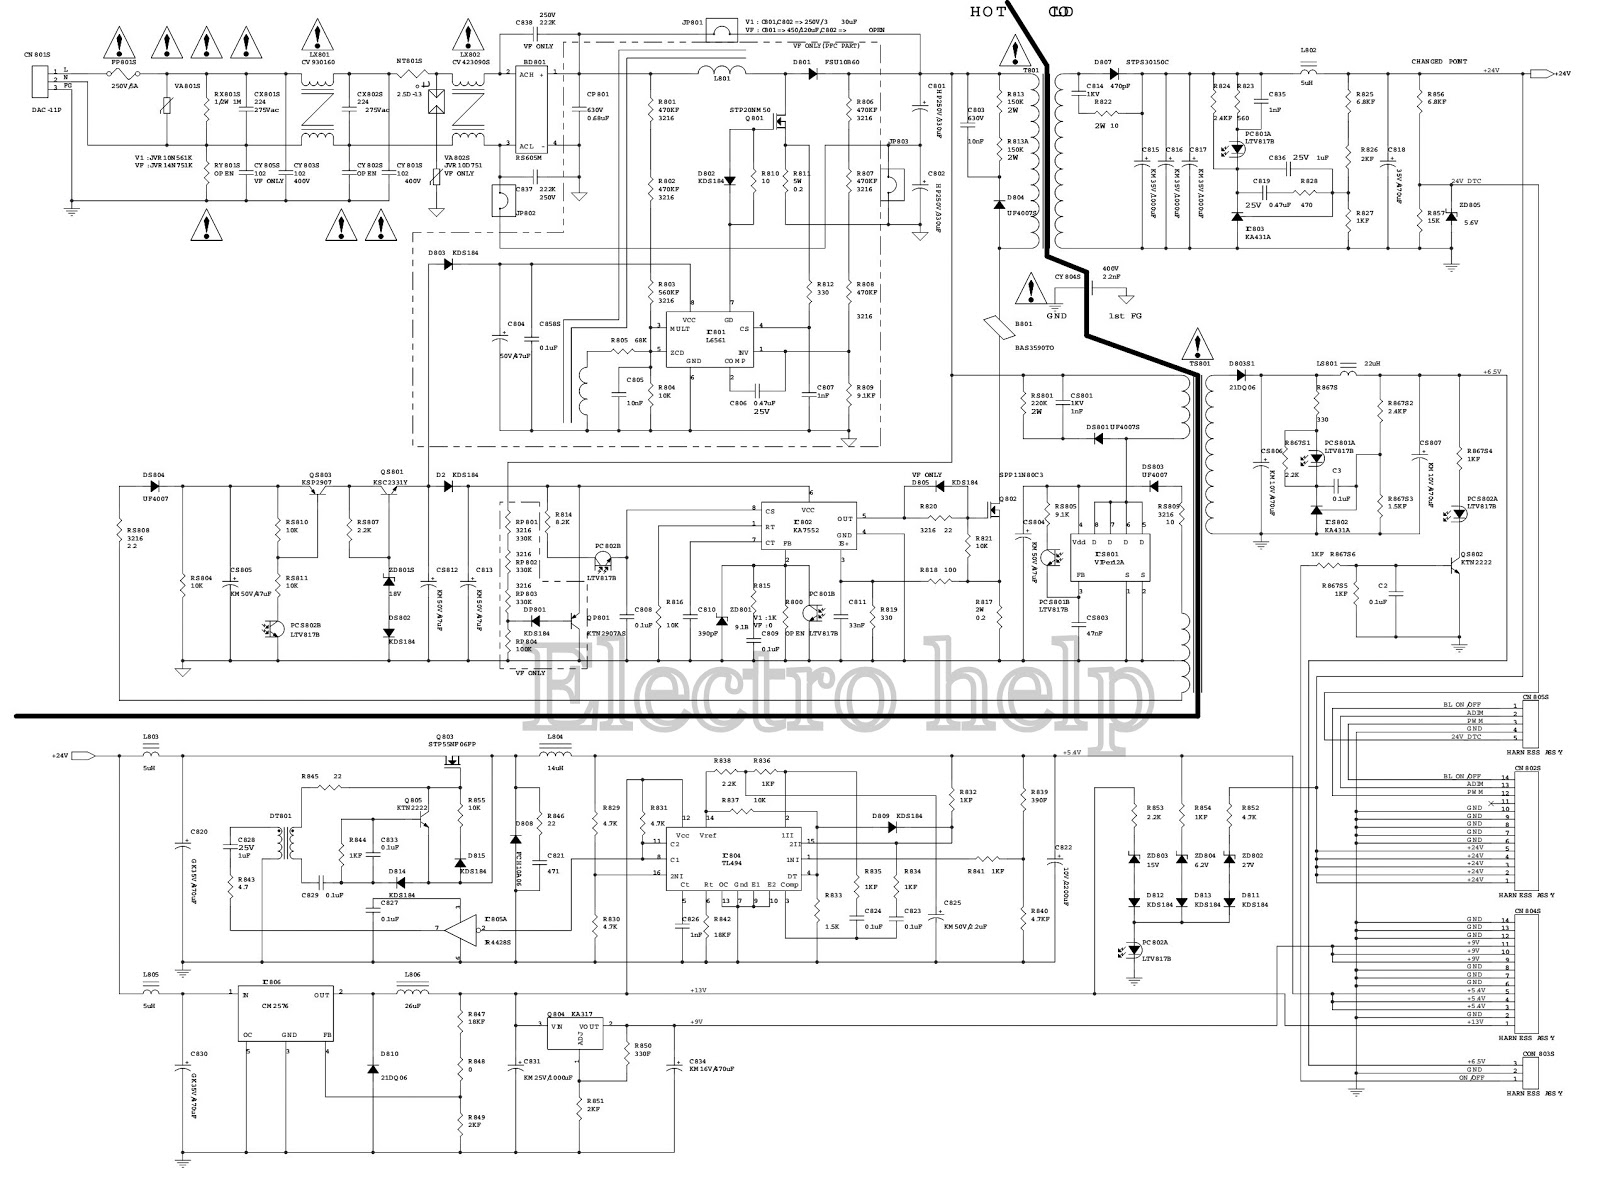 medium resolution of philips tv circuit diagram how to repair led tv backlight problem no picture